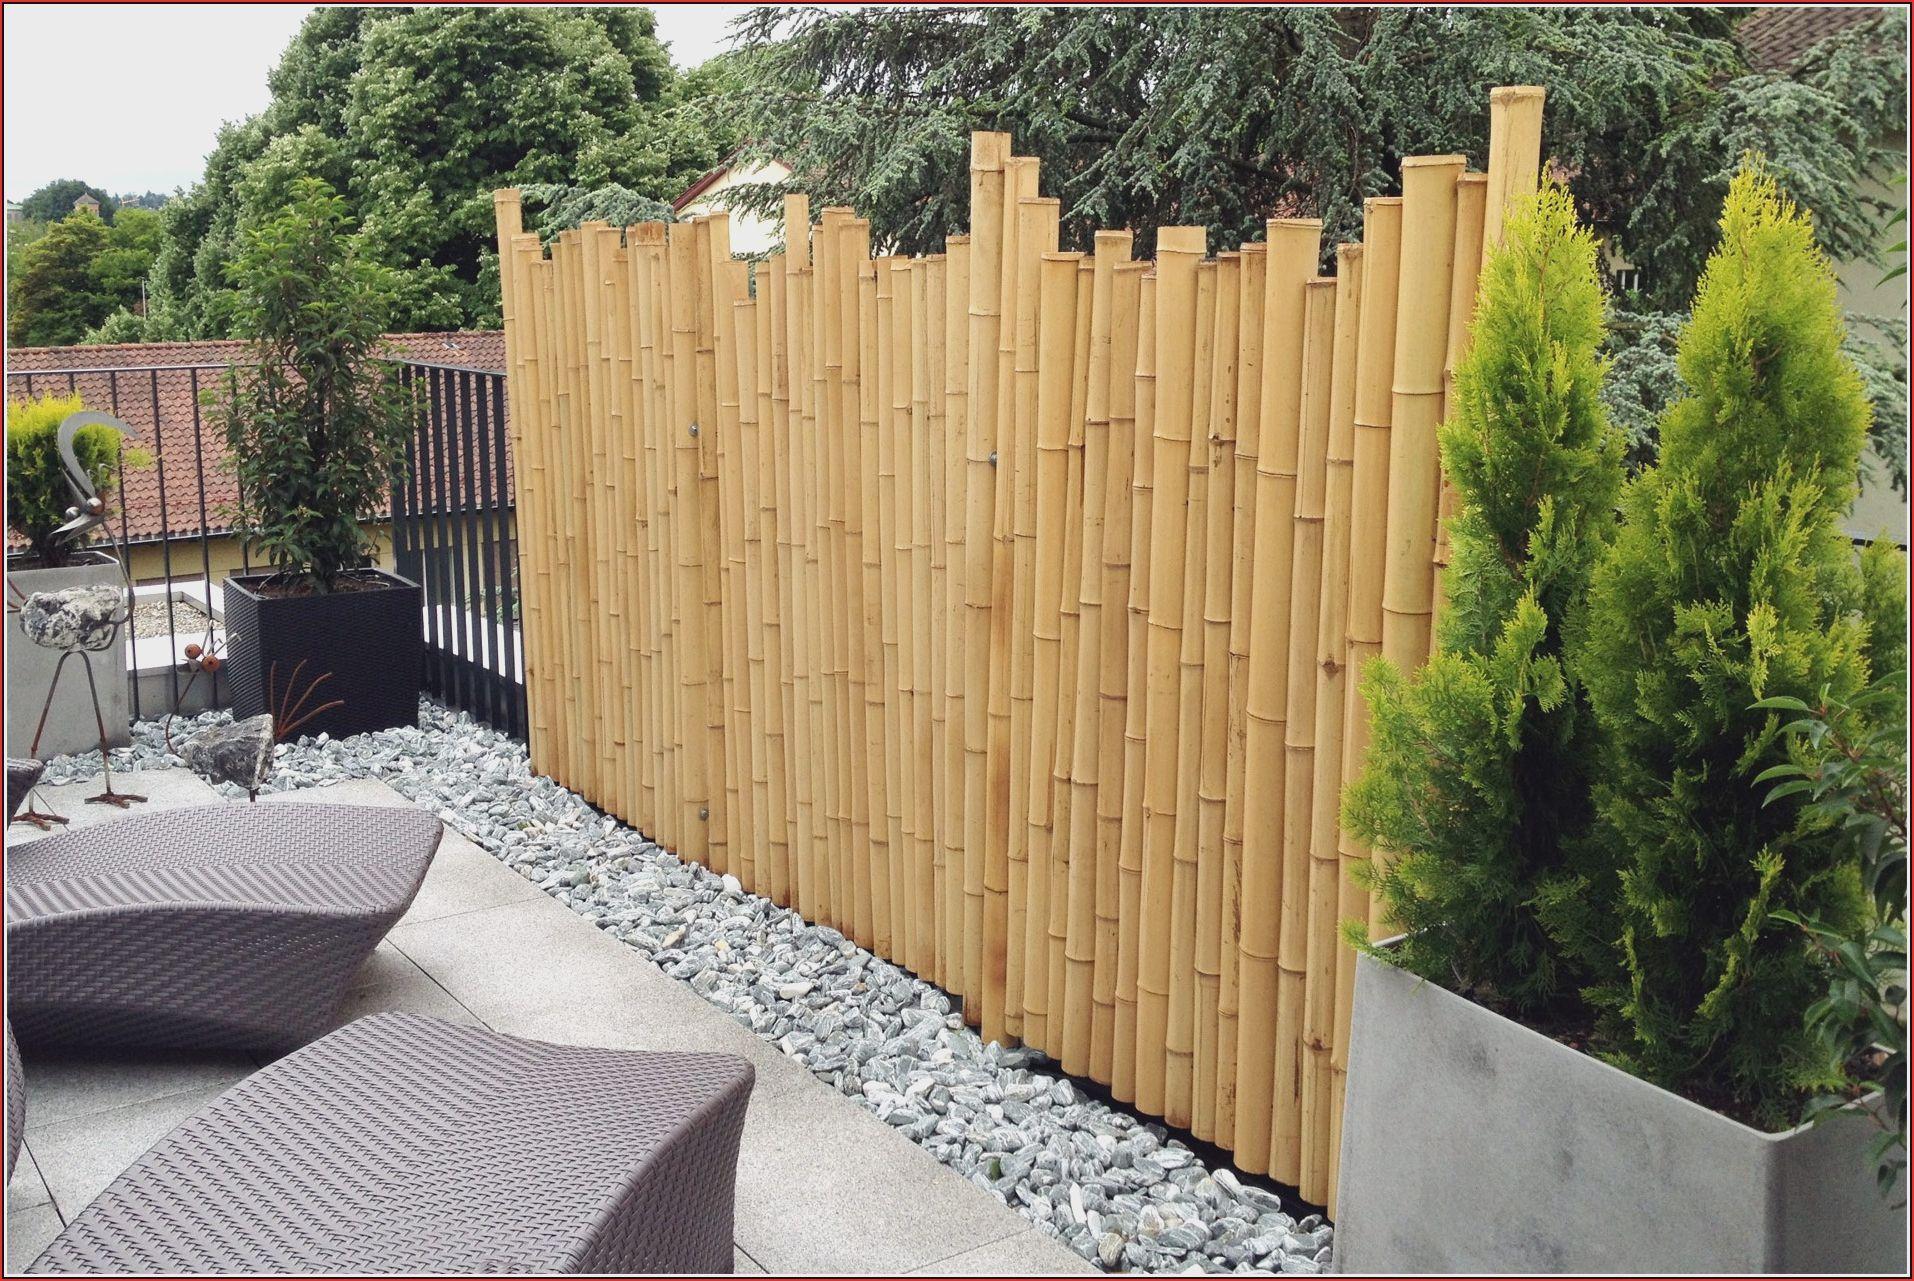 Garten Planen 26 Oberteil Bambus Sichtschutz Balkon O38p